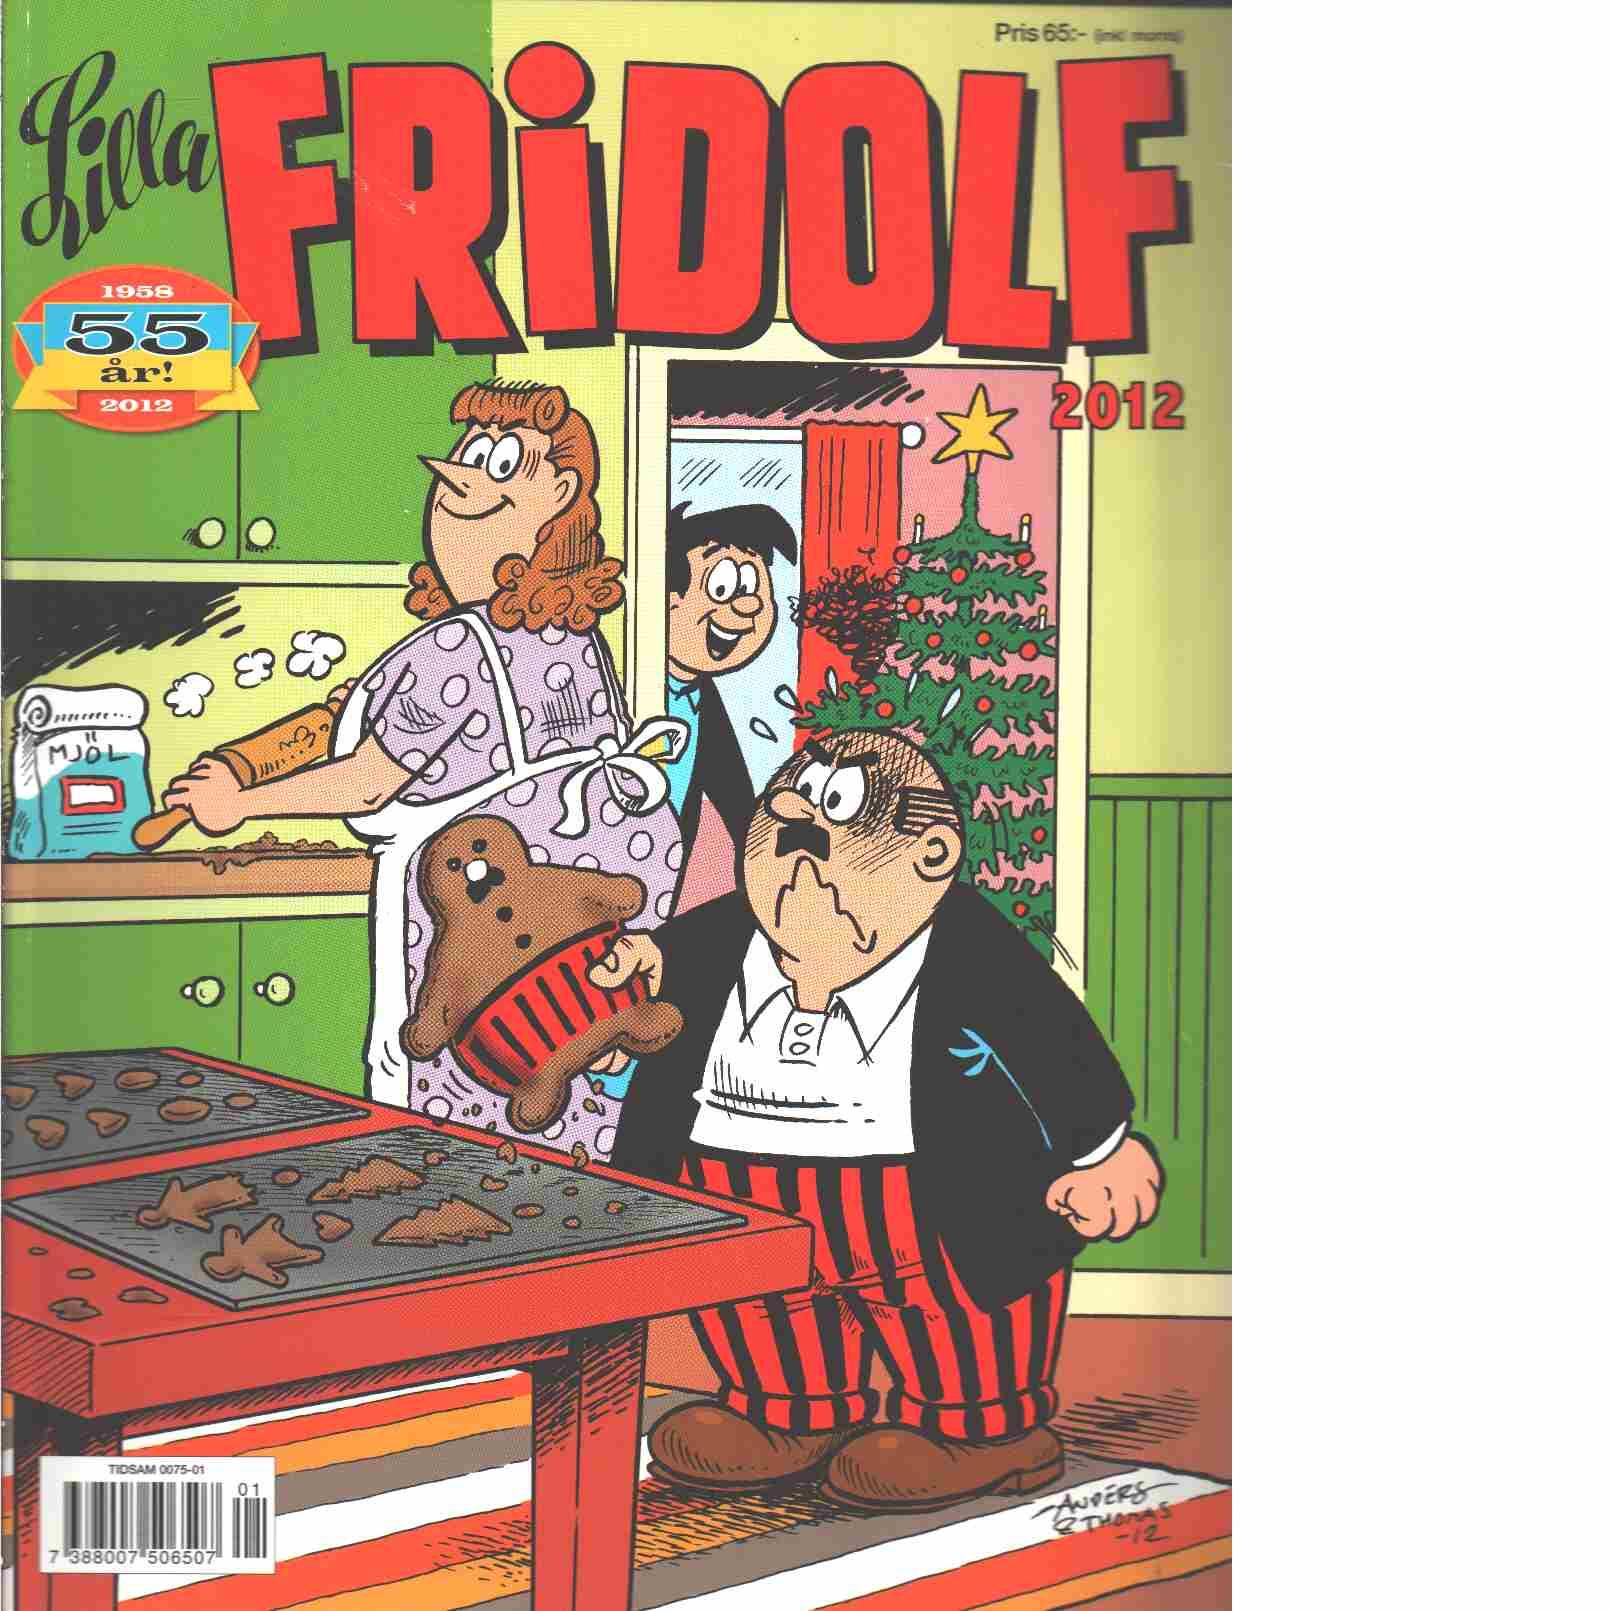 Lilla Fridolf Julalbum 2012 - Persson, Gunnar